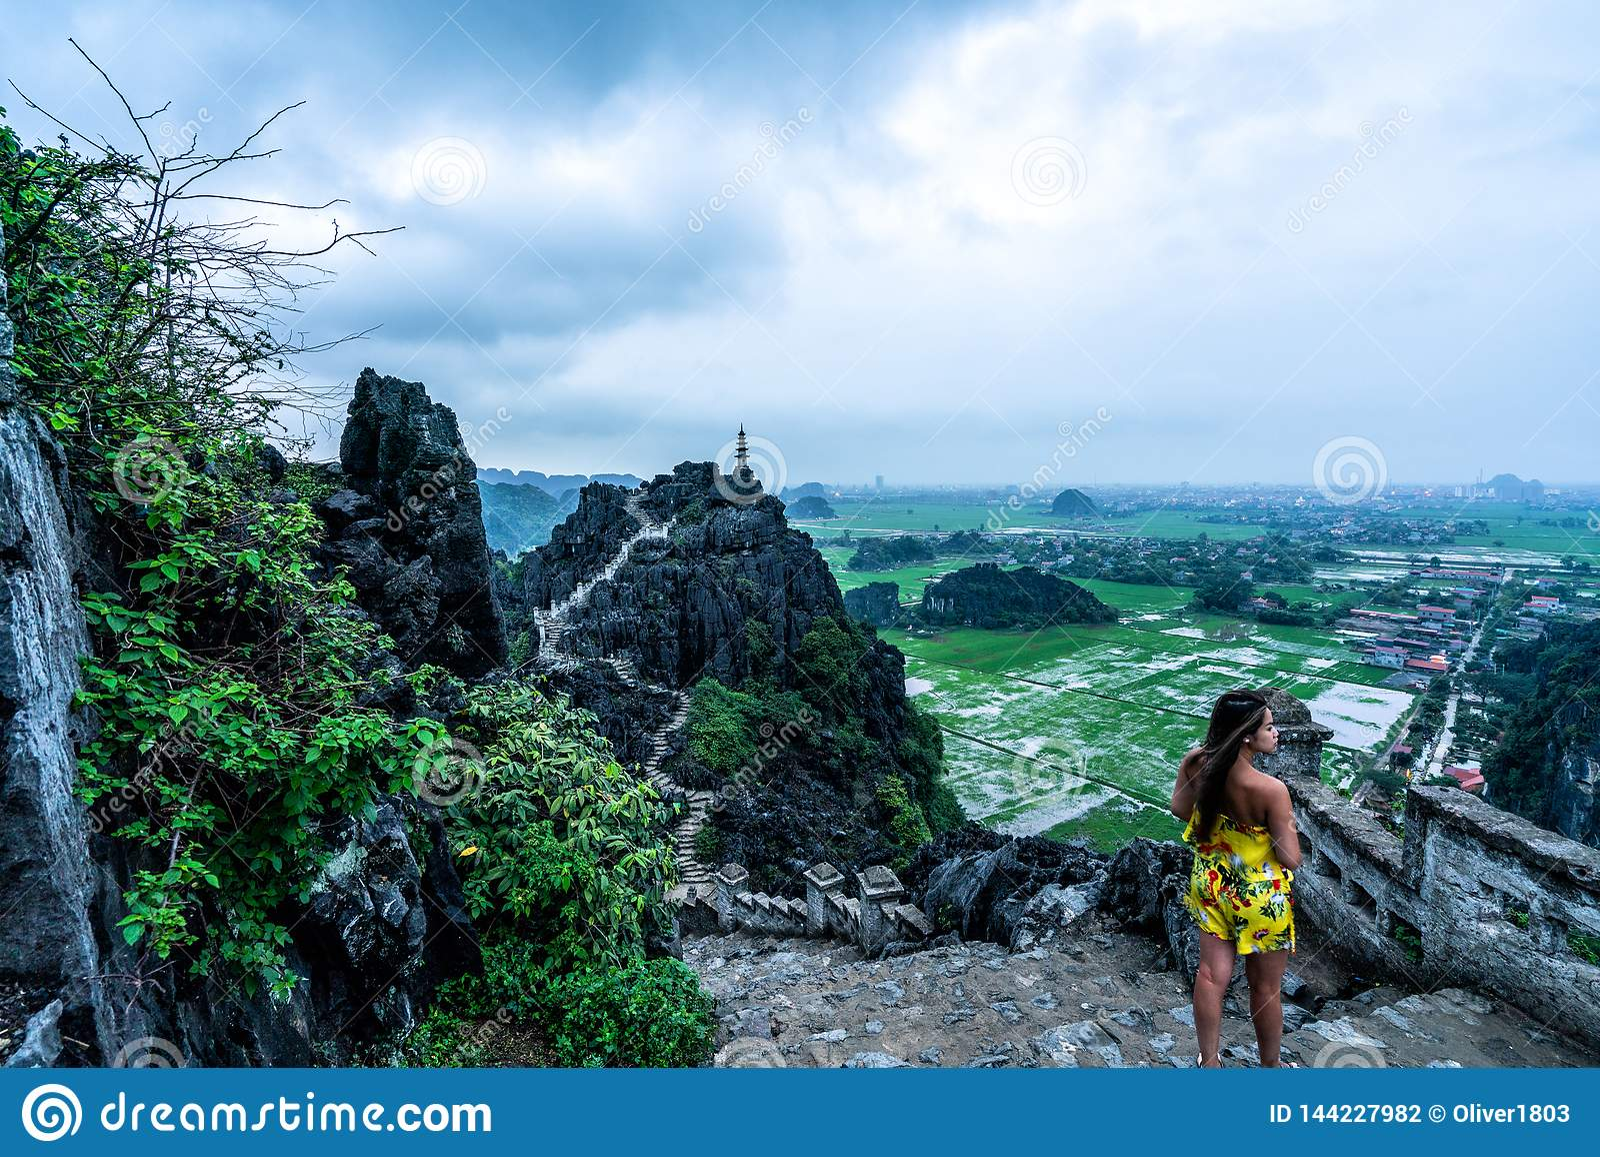 Una mujer pasa por alto las montañas de Vietnam septentrional de Hang Mua, un destino que camina popular